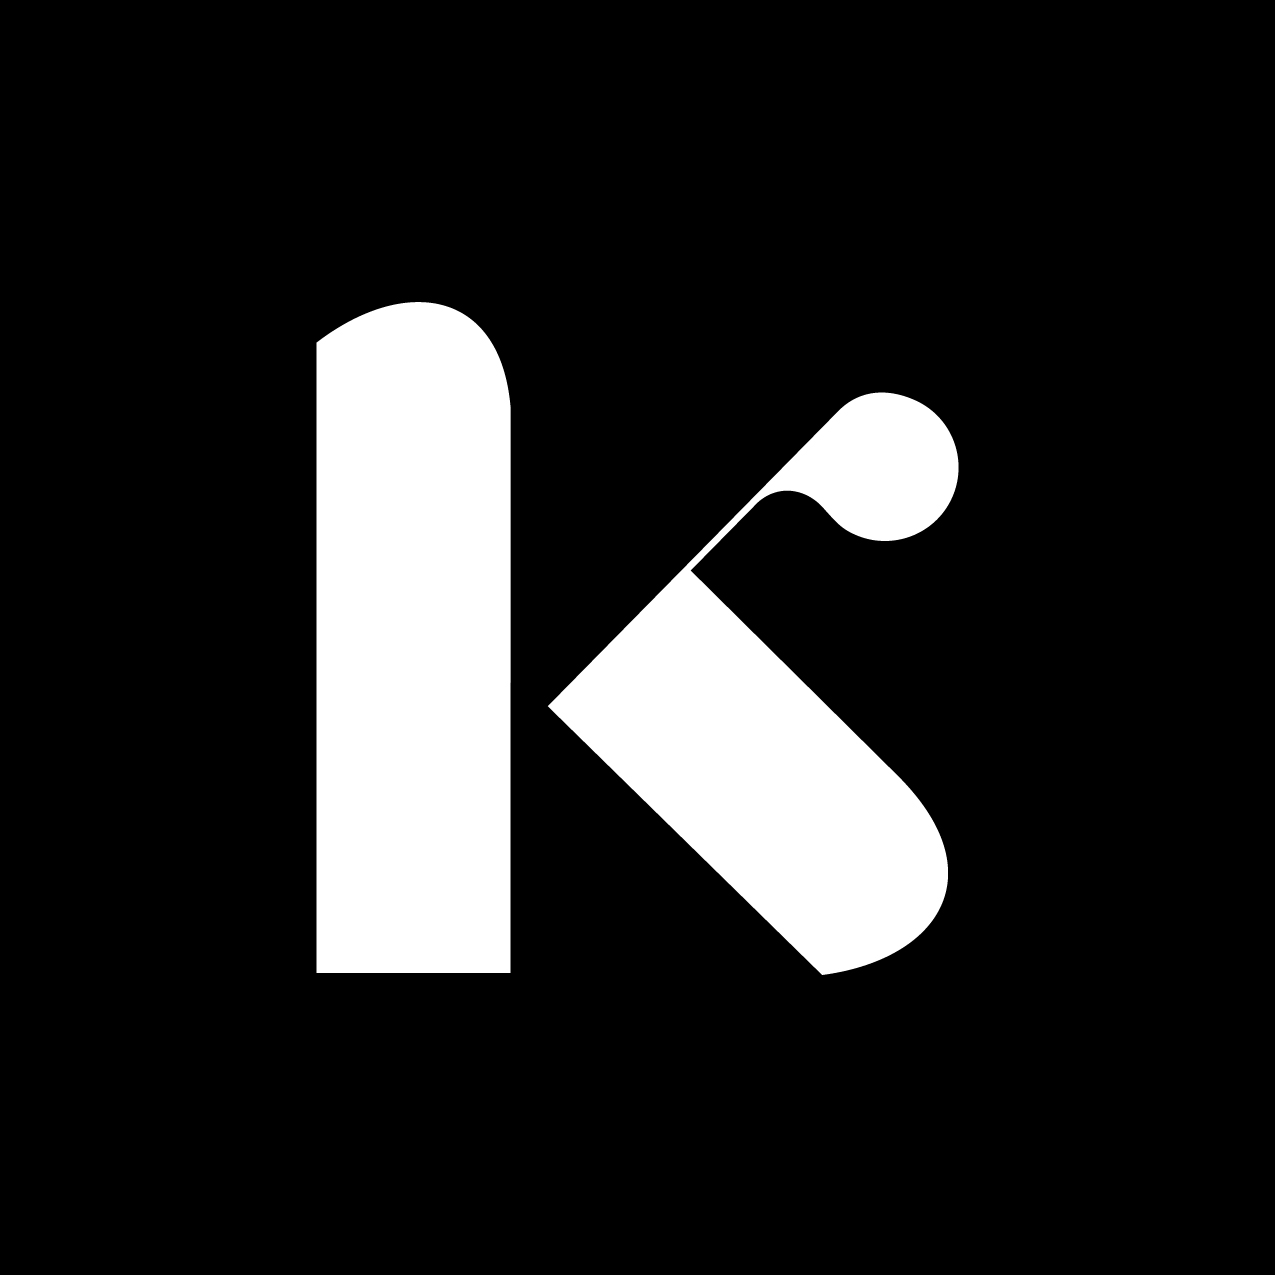 Letter K8 Design by Furia